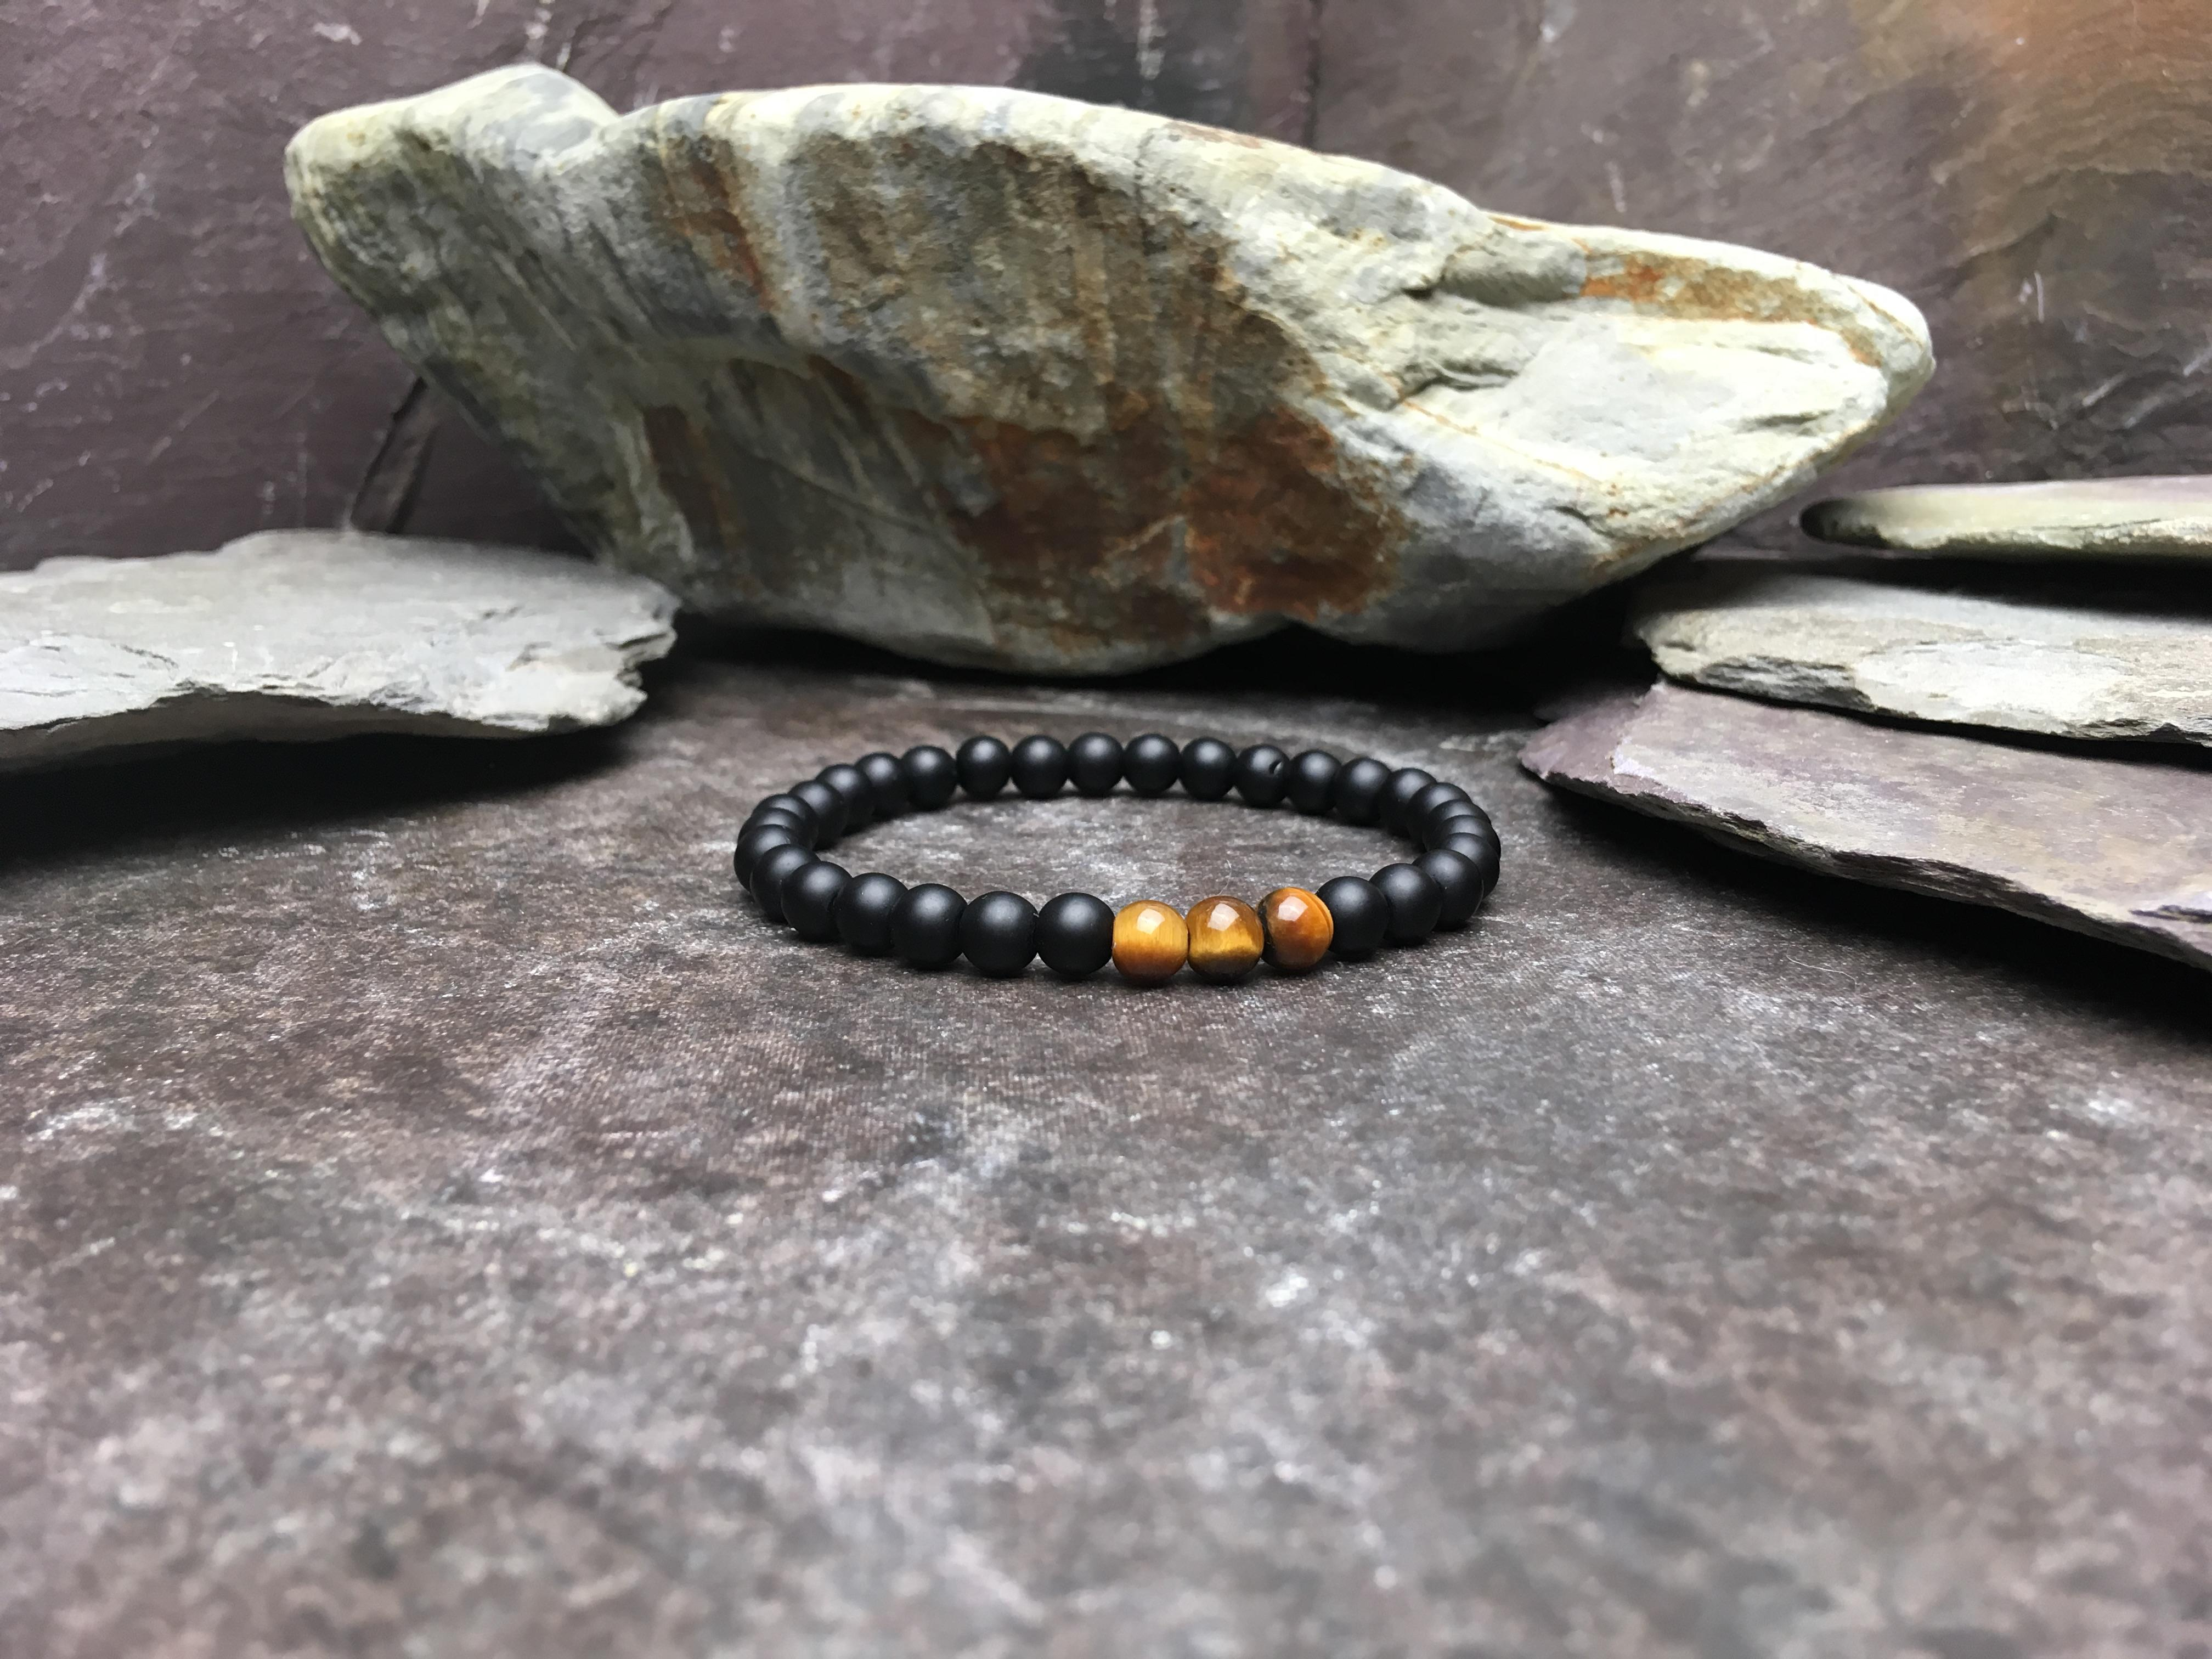 6mm Onyx and Tigers Eye Bead Bracelet